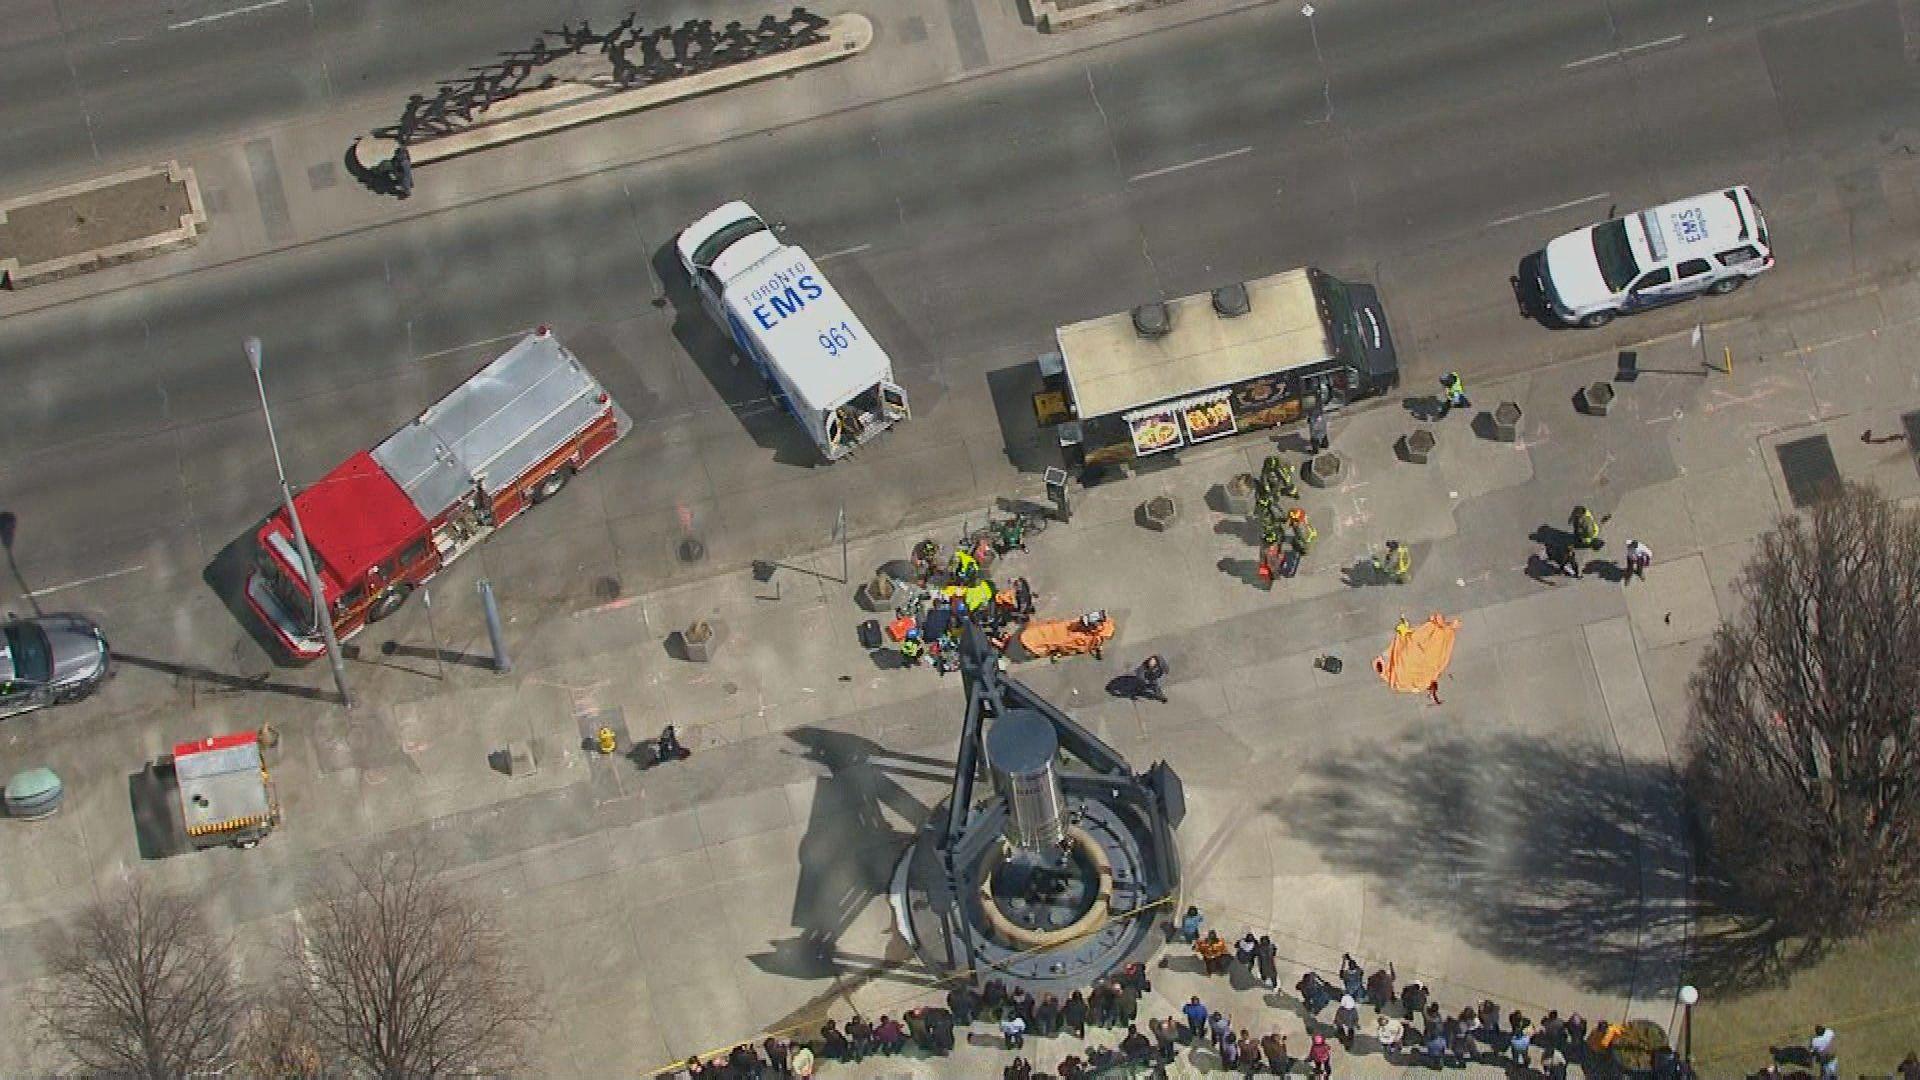 7c7b512376 Twenty-five minutes of horror on Yonge Street  How the Toronto van attack  unfolded